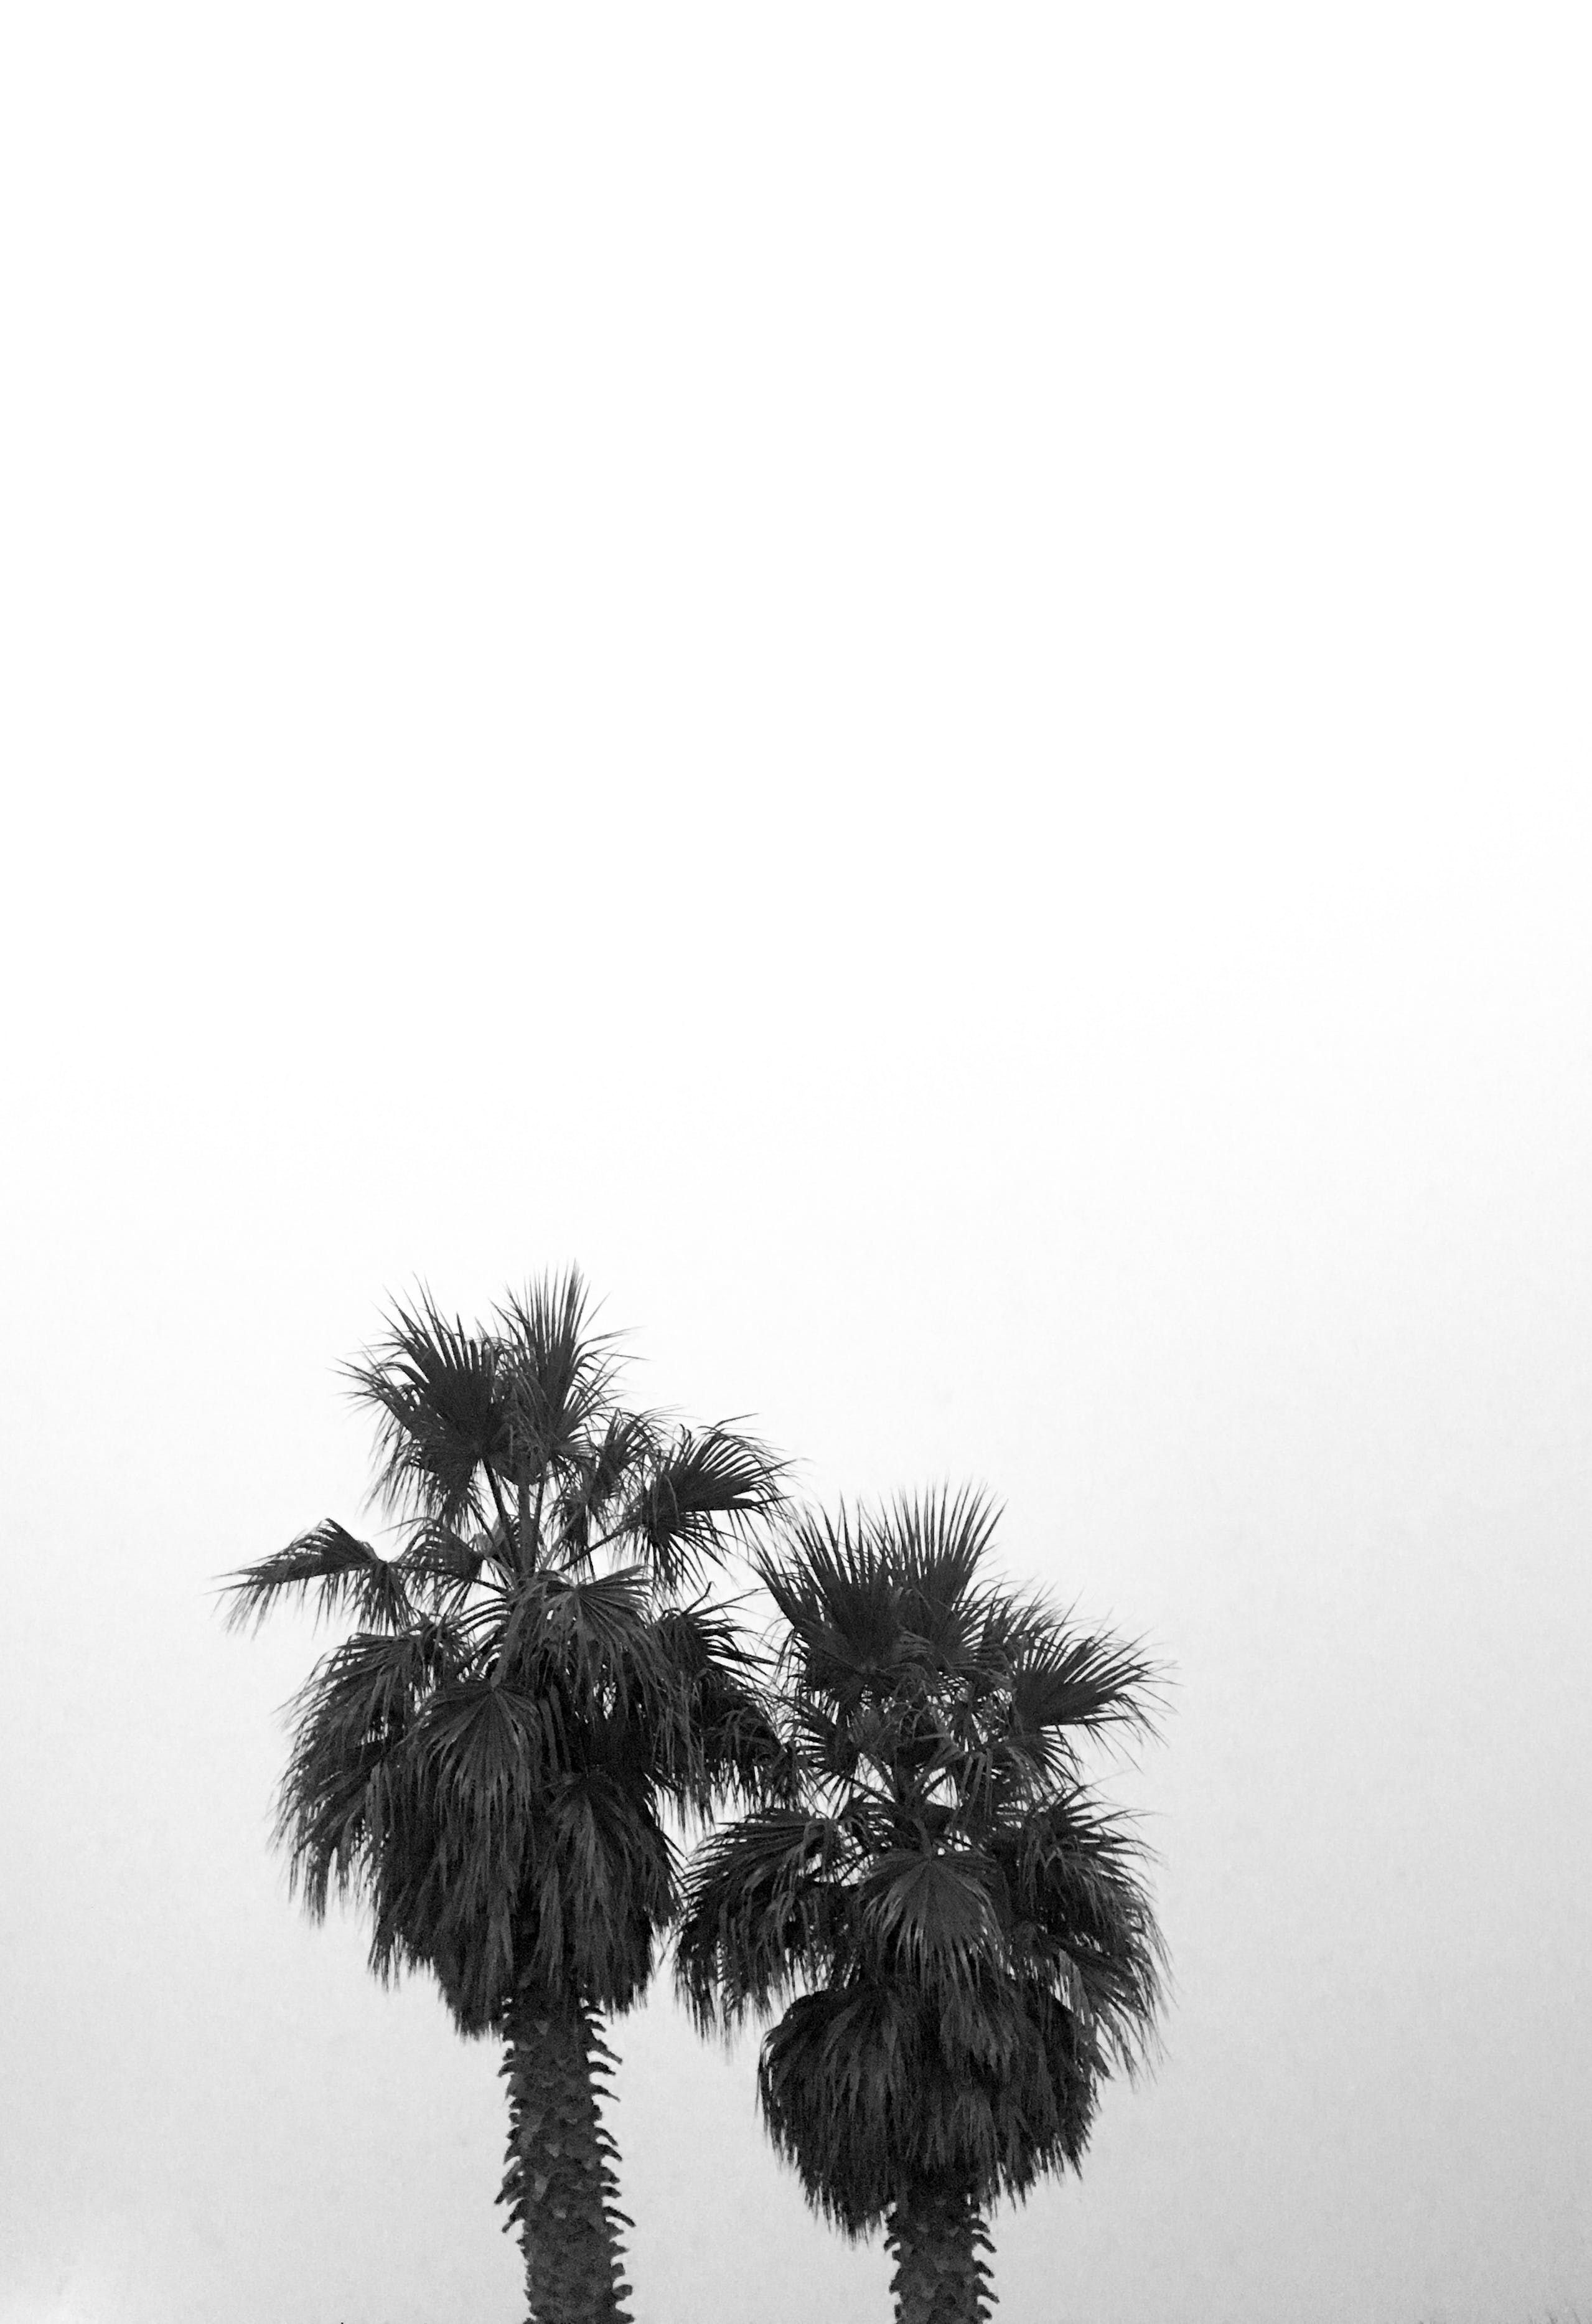 Free stock photo of palm, palm tree, palm trees, tree